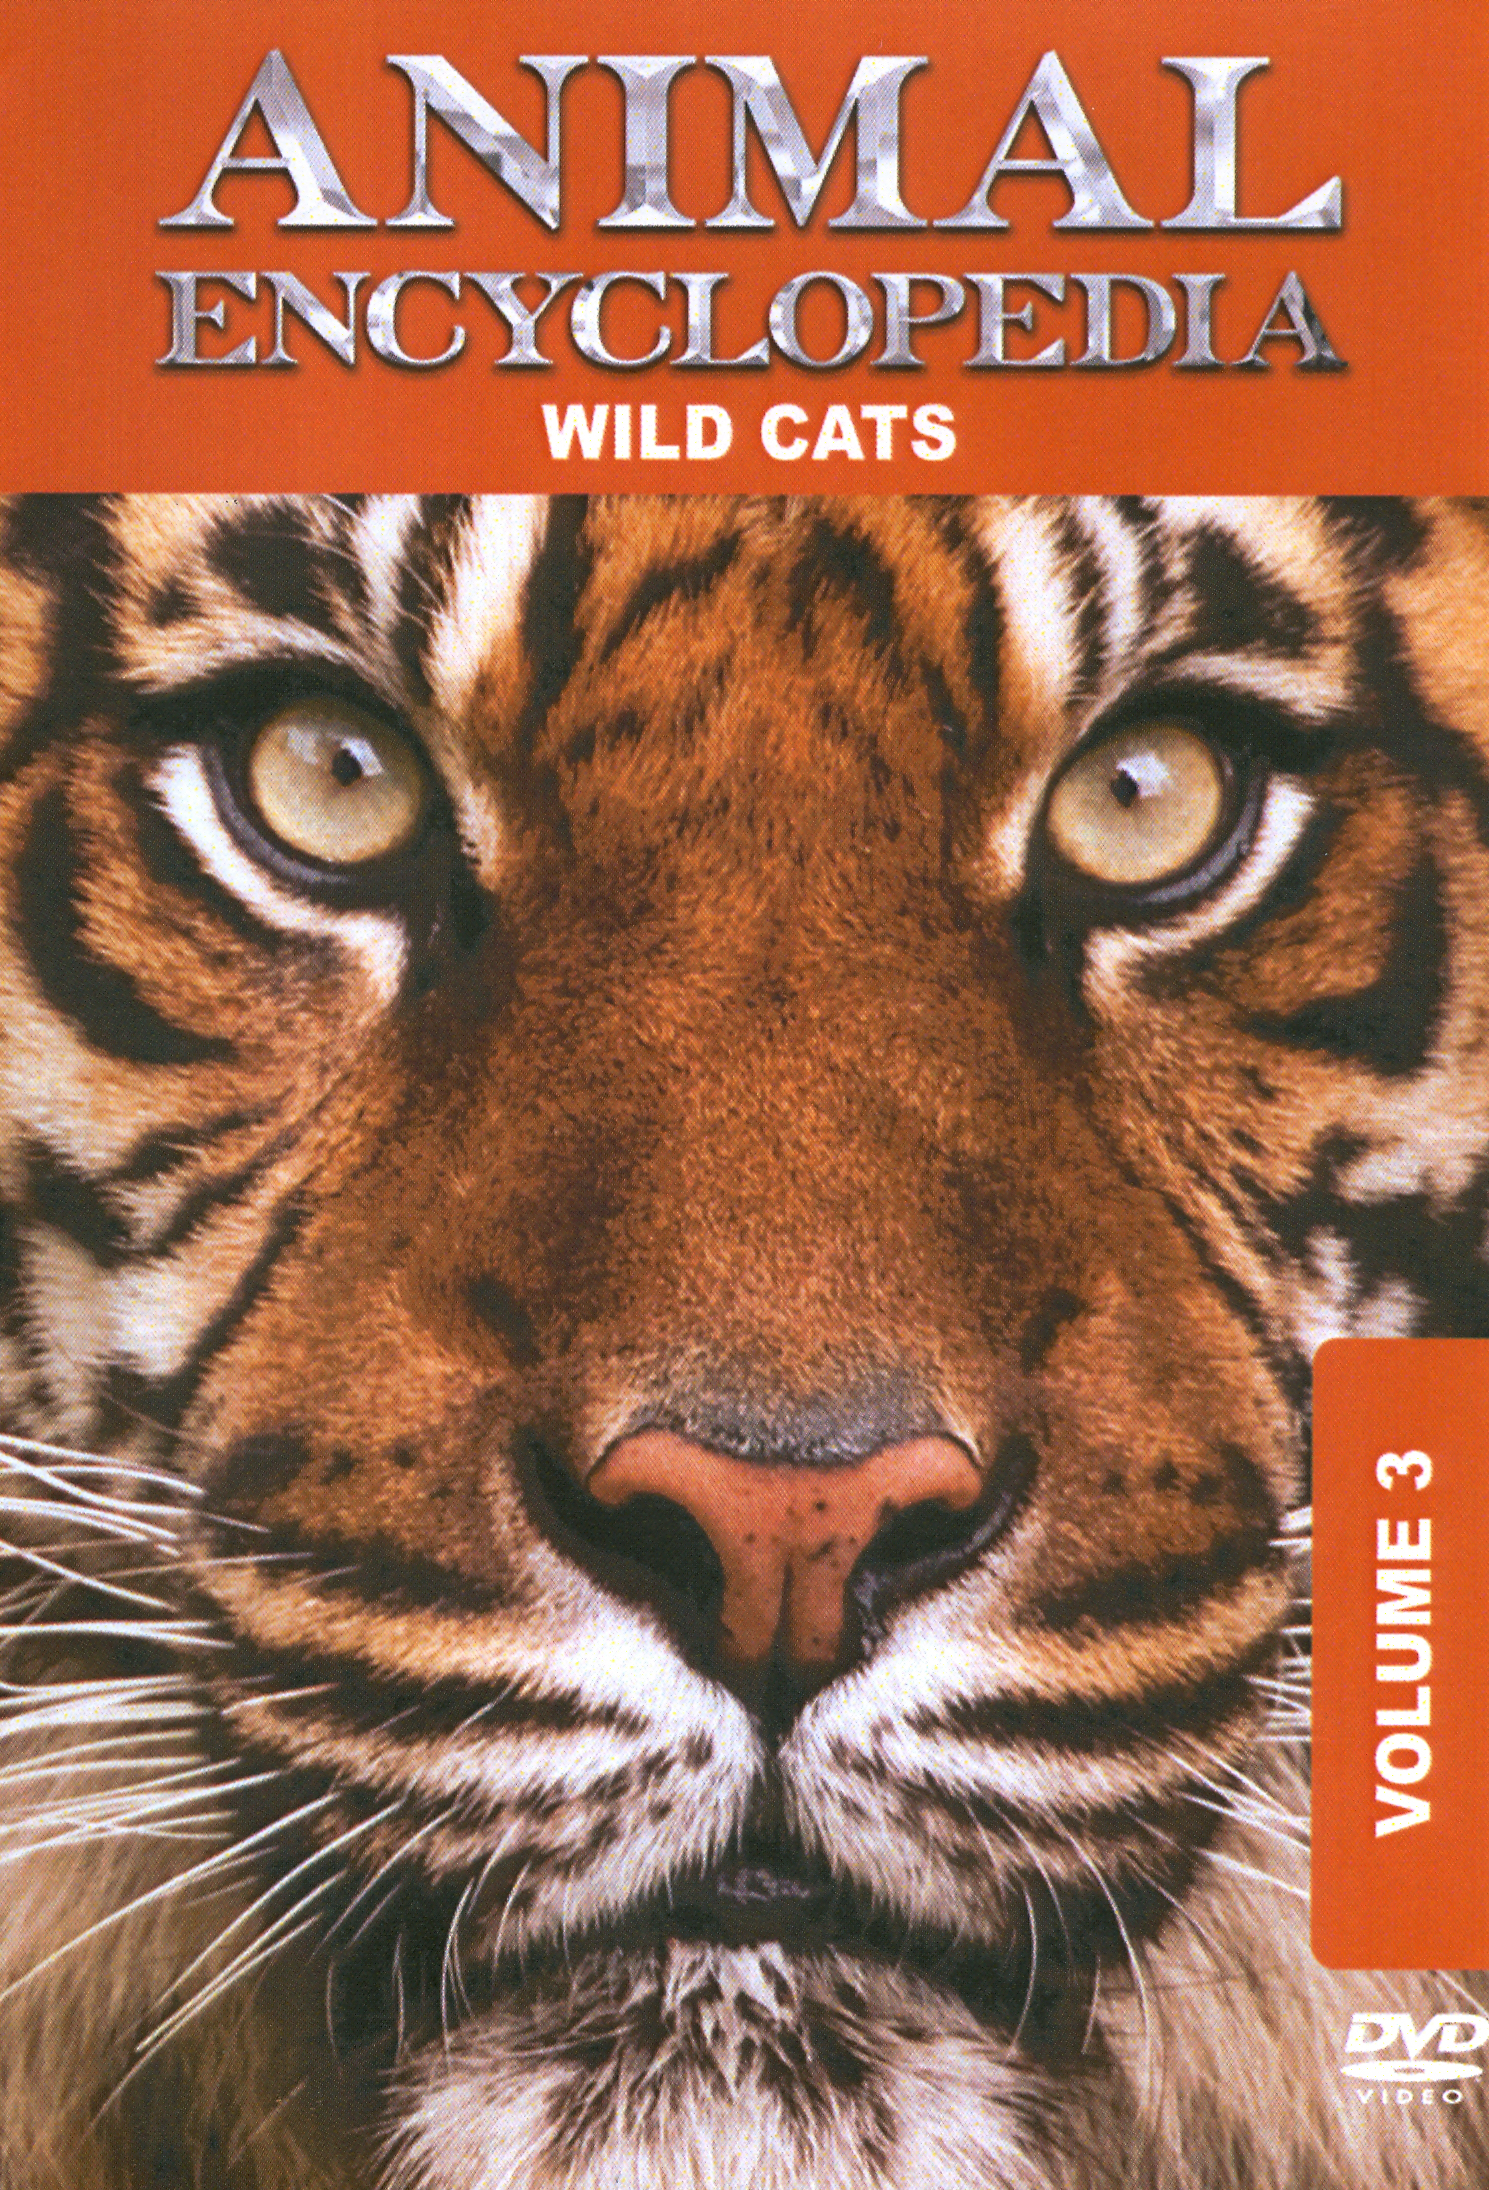 Animal Encyclopedia, Vol. 3: Wild Cats